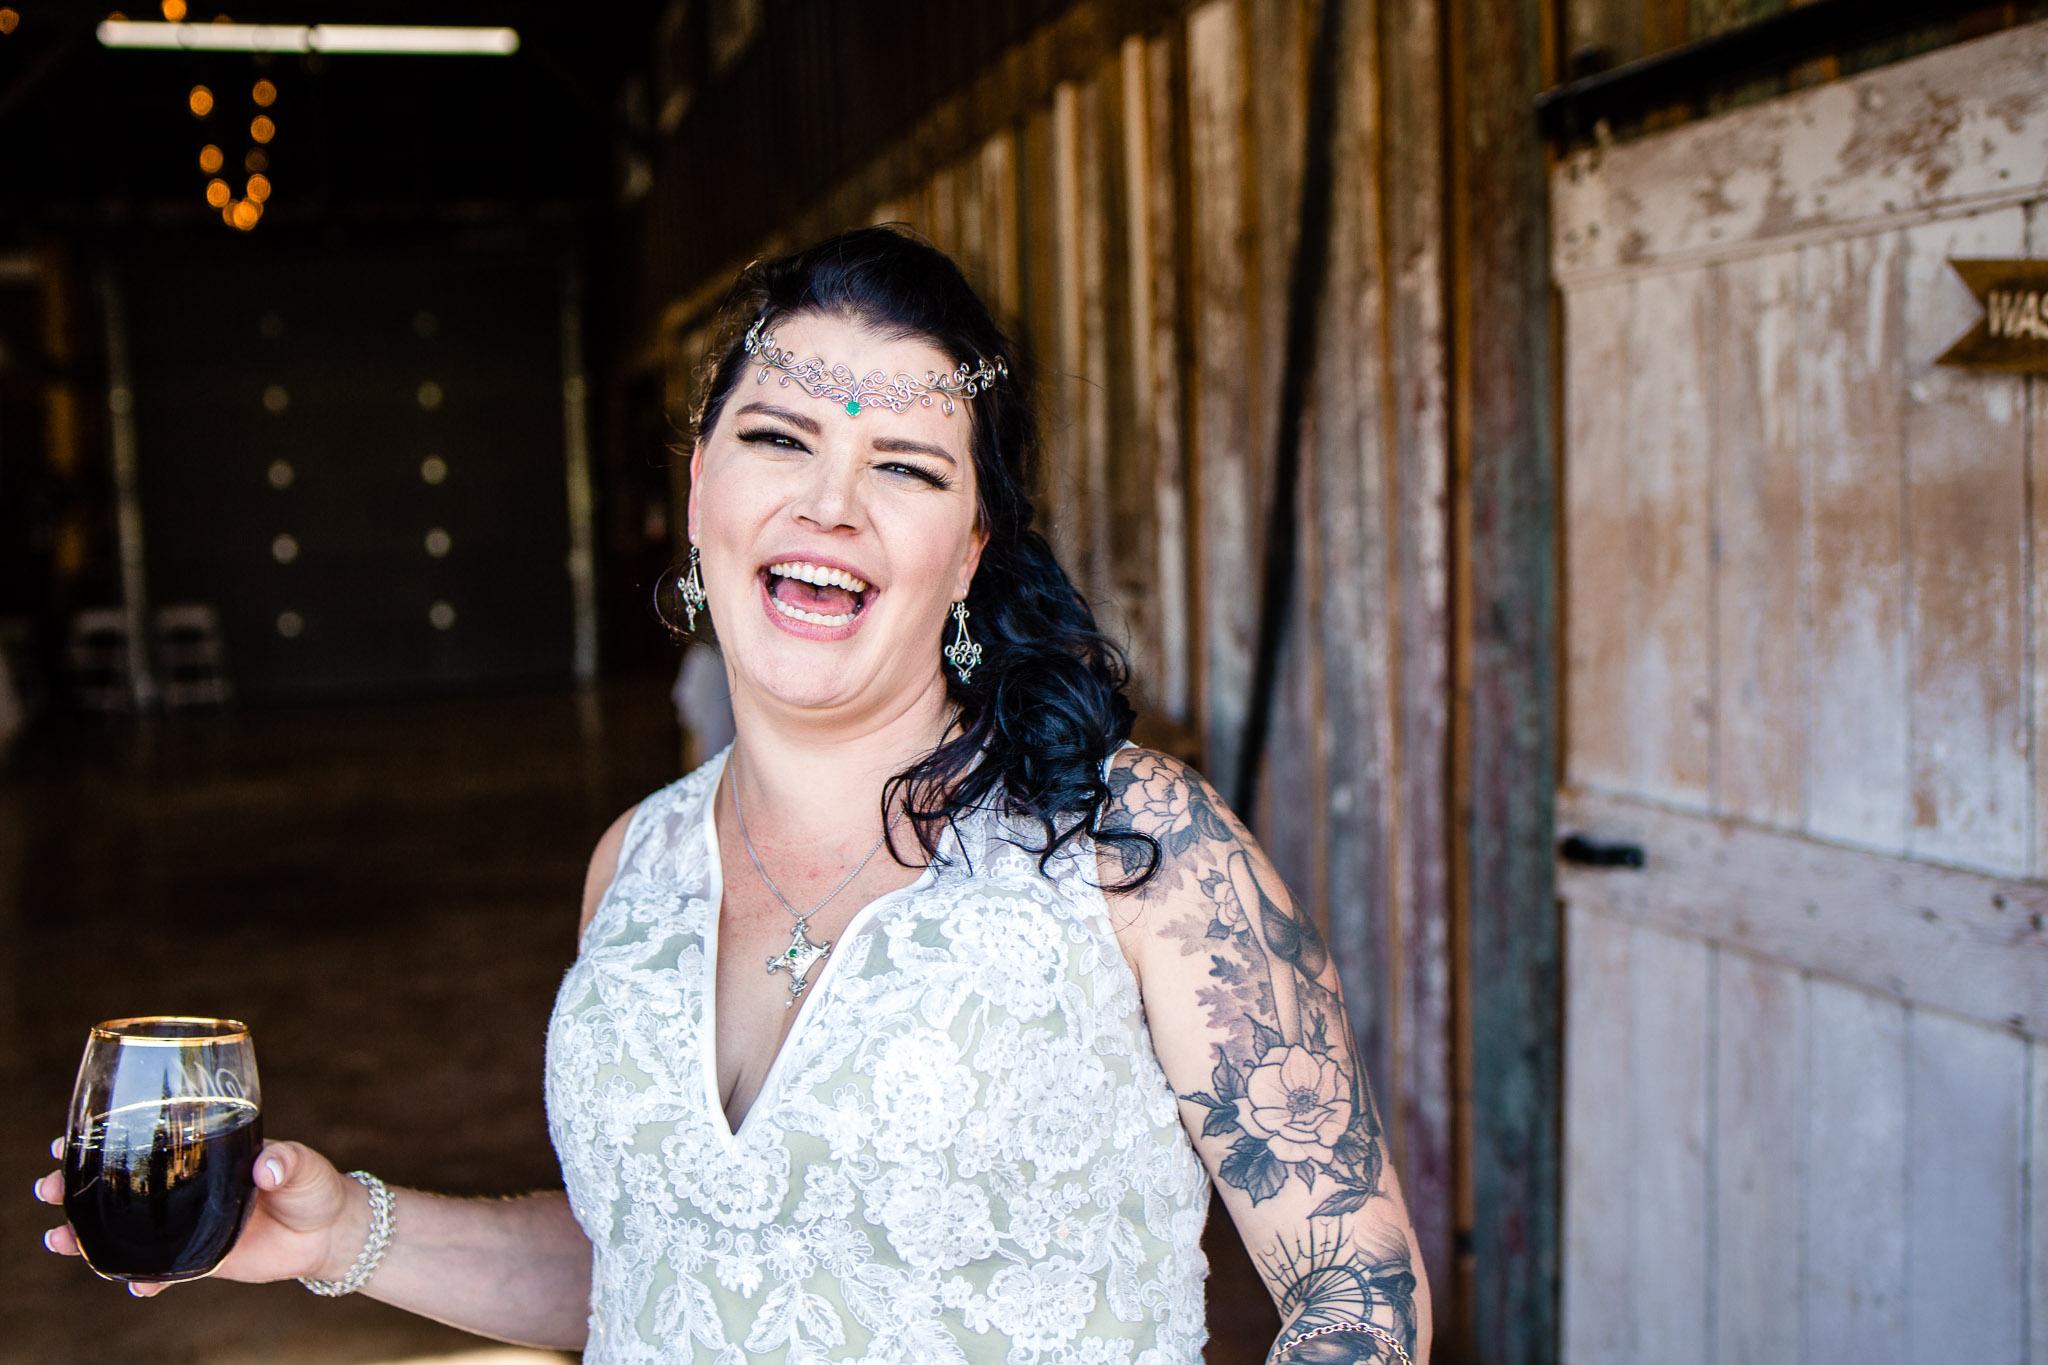 White-Owl-Barn-Langley-Wedding-Photographer-Rustic-Scottish-Country-Food-Truck-Documentary-Open-Bar-Wedding-855.jpg